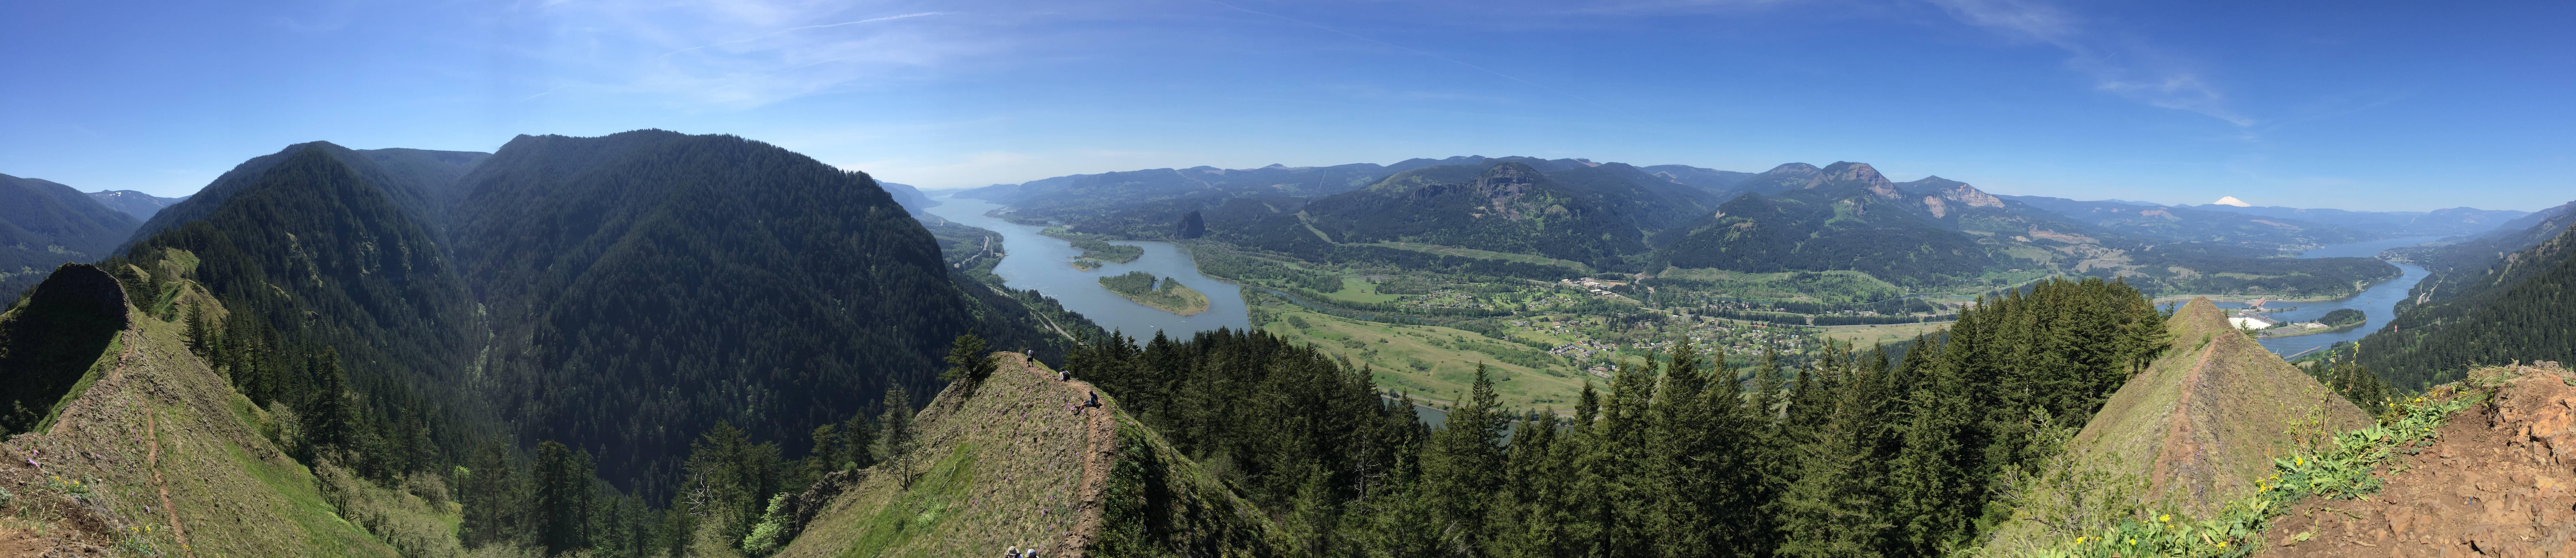 Munra Point Oregon [13632 x 2952][OC] Taken on my phone